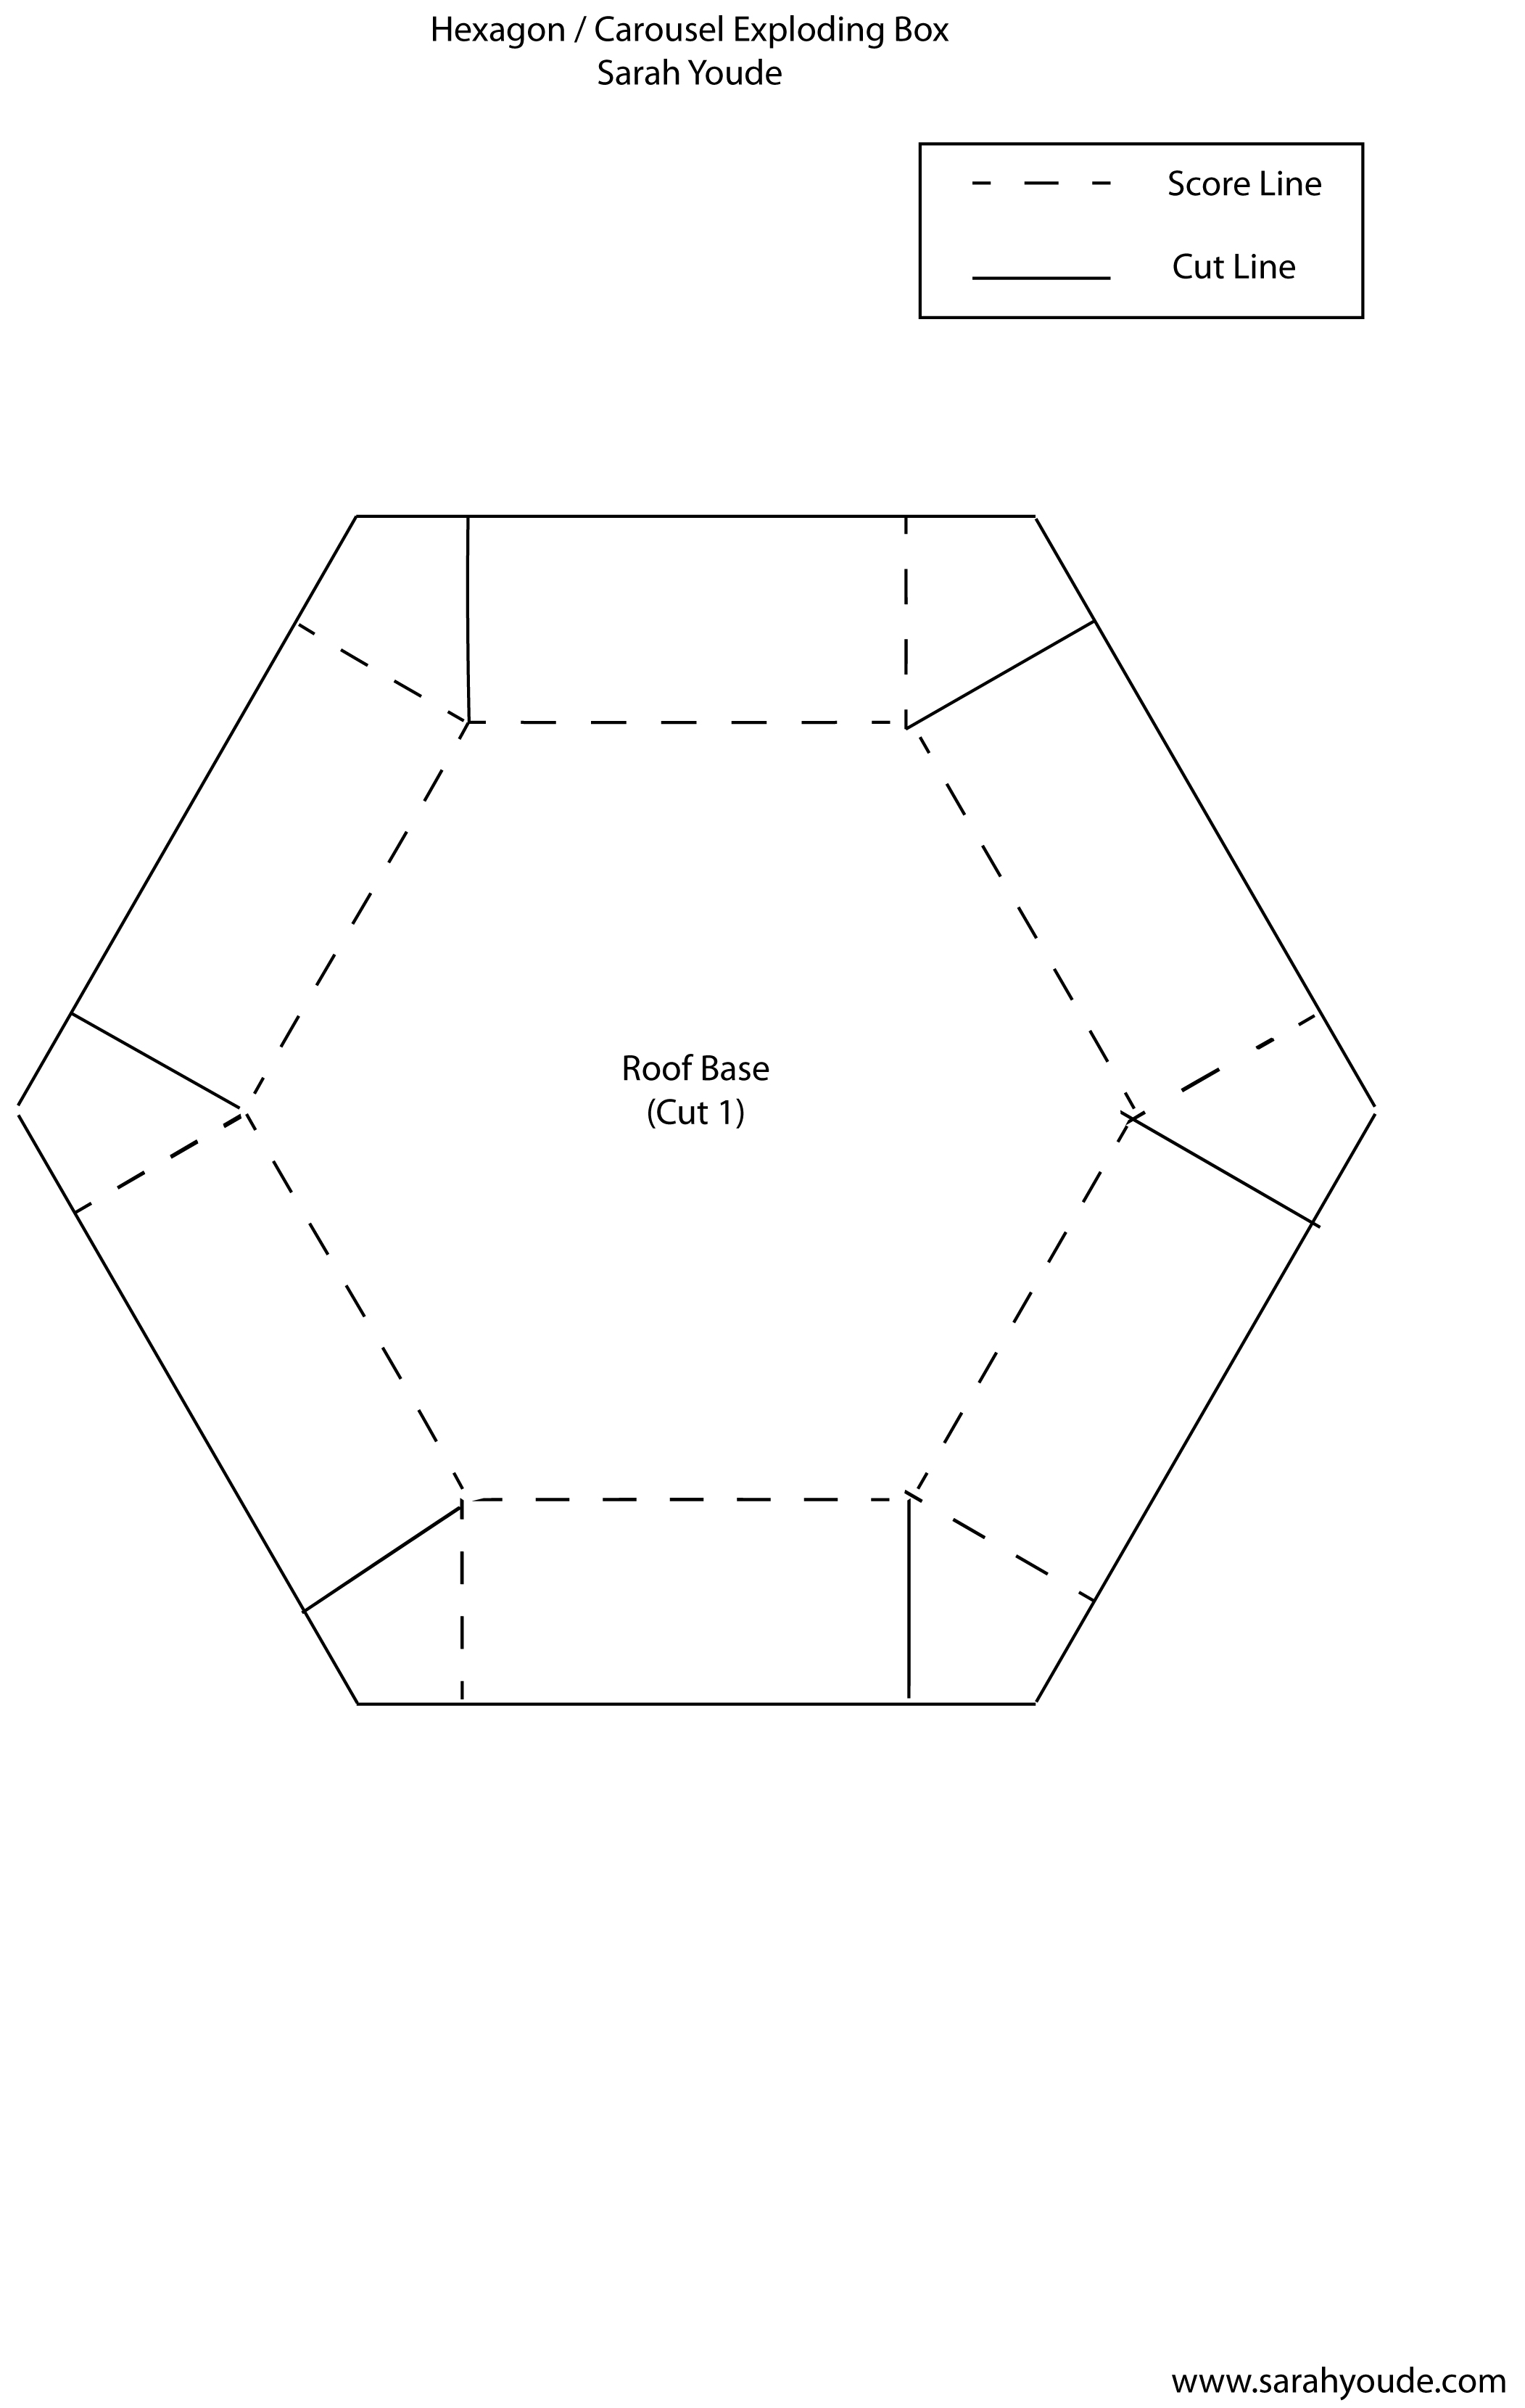 A Dorky Emu: Exploding Hexagon Carousel Box - Video Tutorial